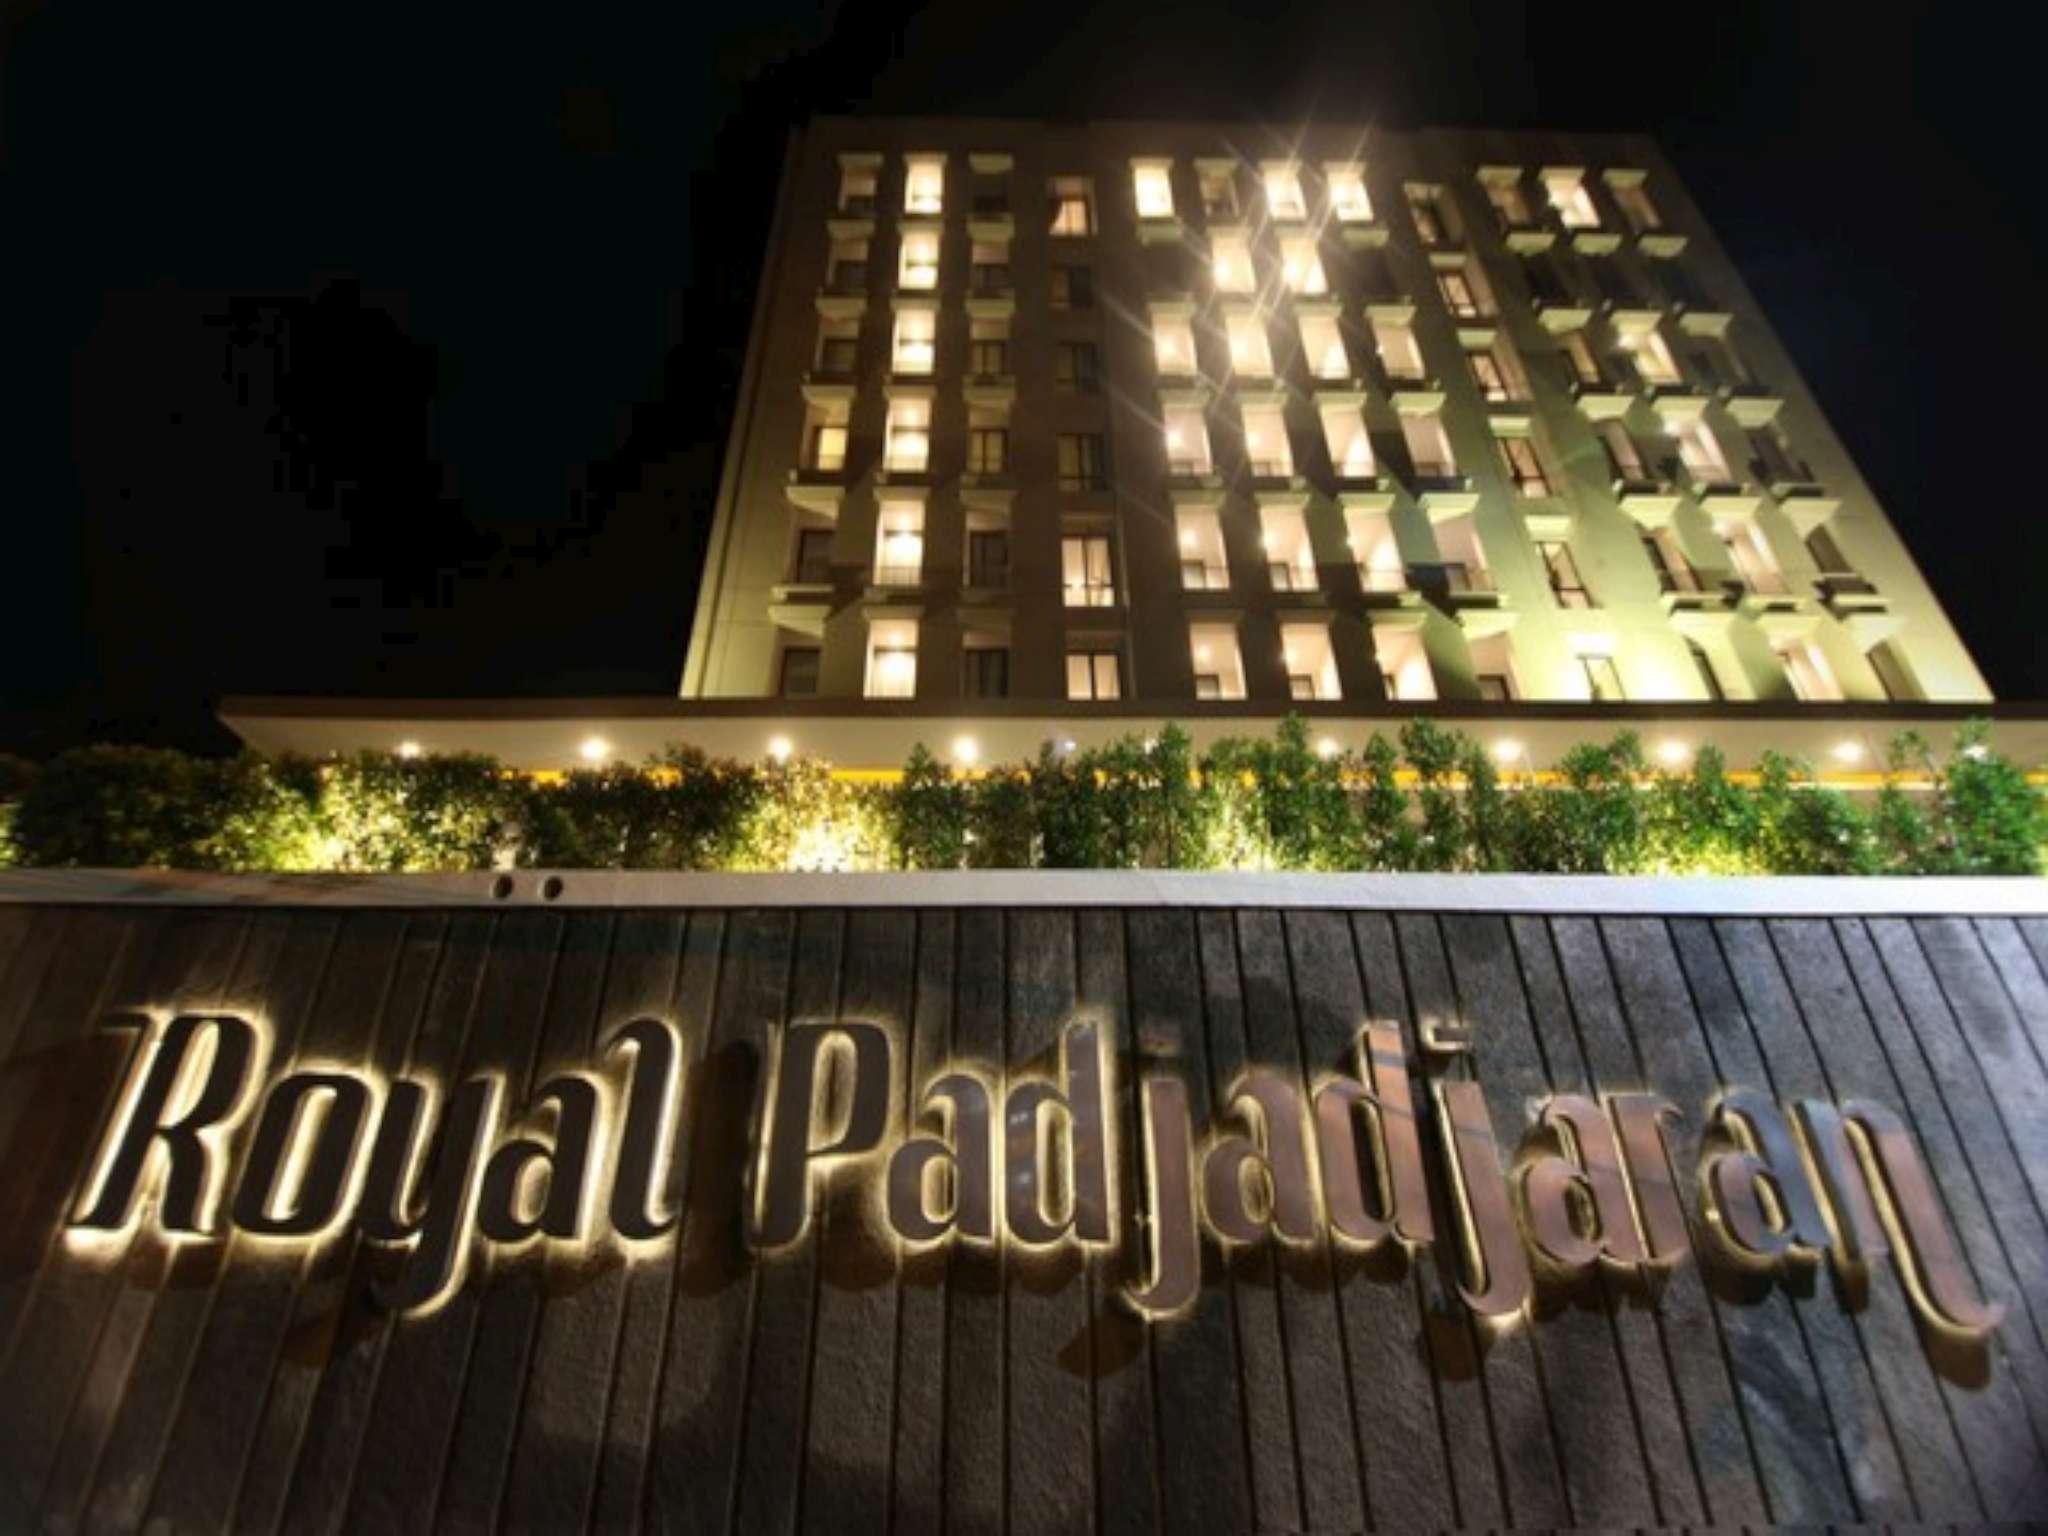 Royal Padjadjaran Bogor